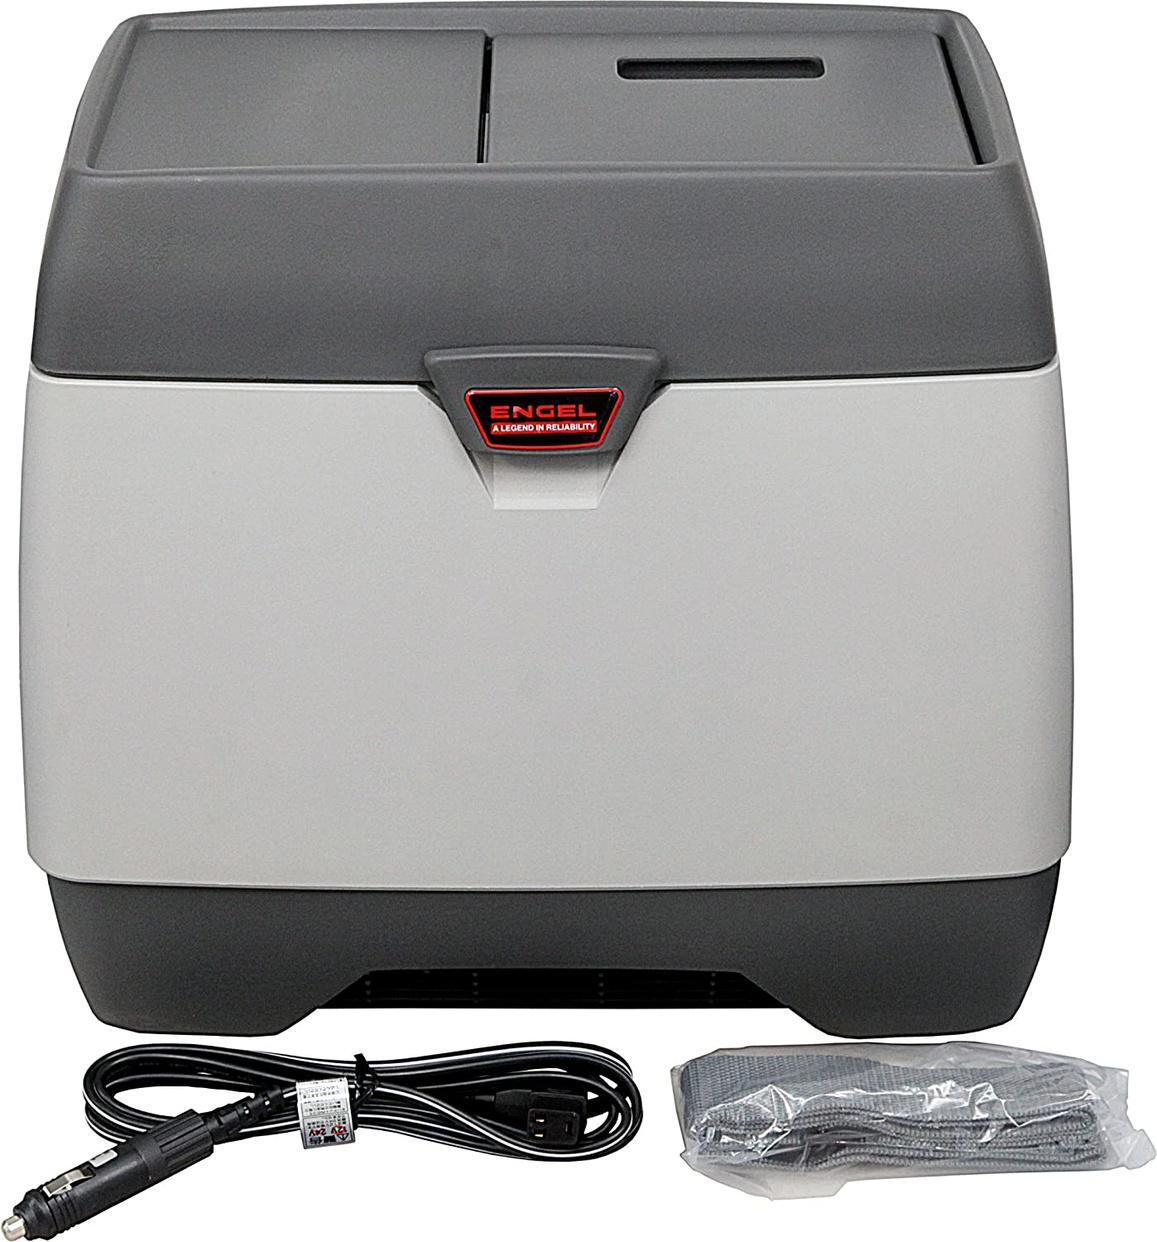 ENGEL(エンゲル) ポータブル冷凍冷蔵庫 MD14F MD14Fの商品画像3